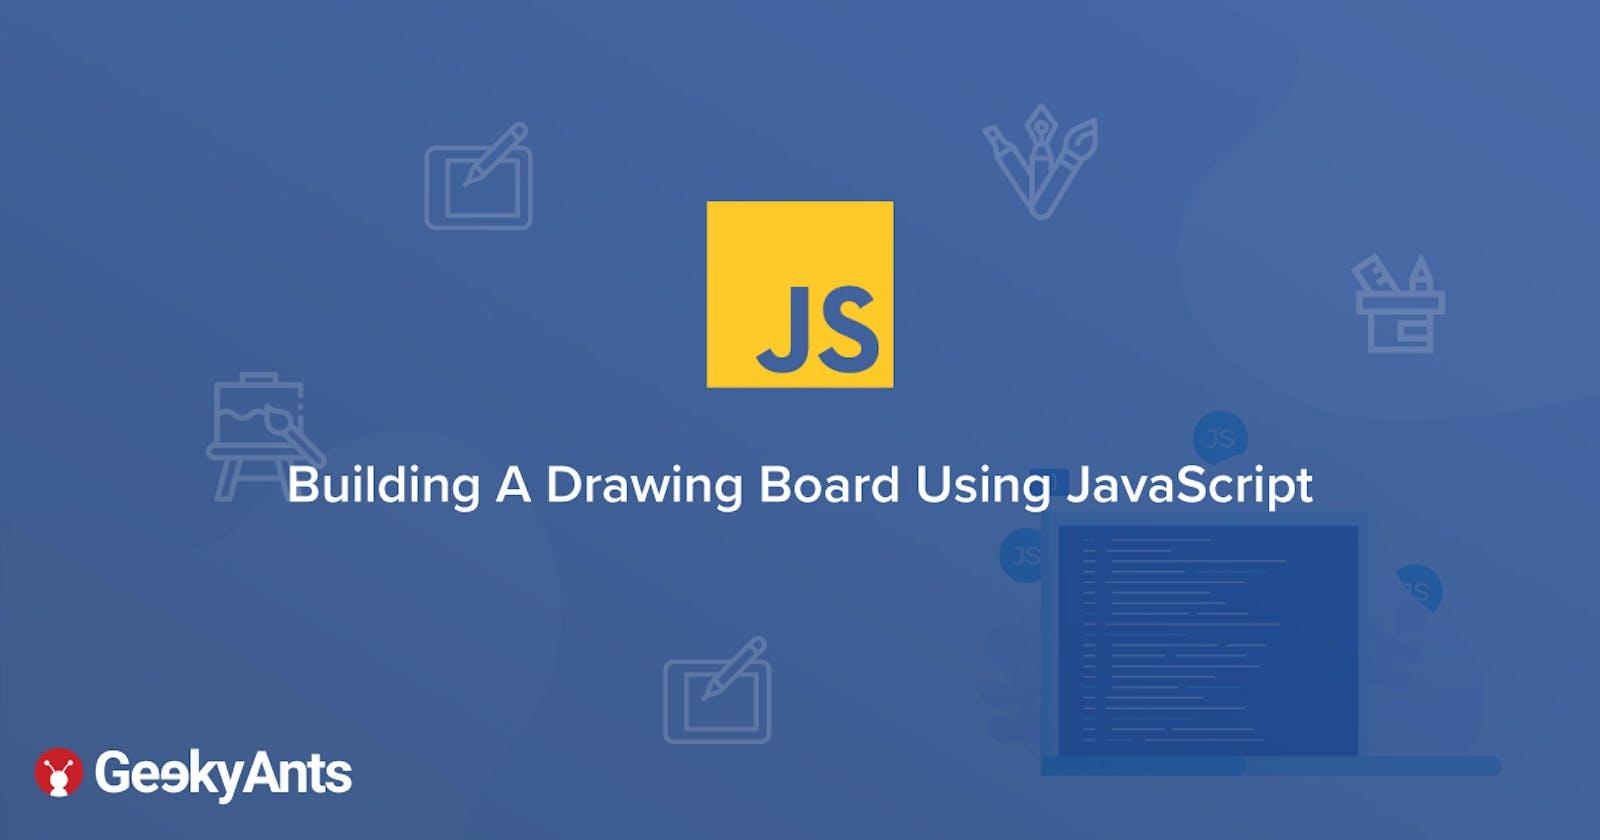 Building A Drawing Board Using JavaScript